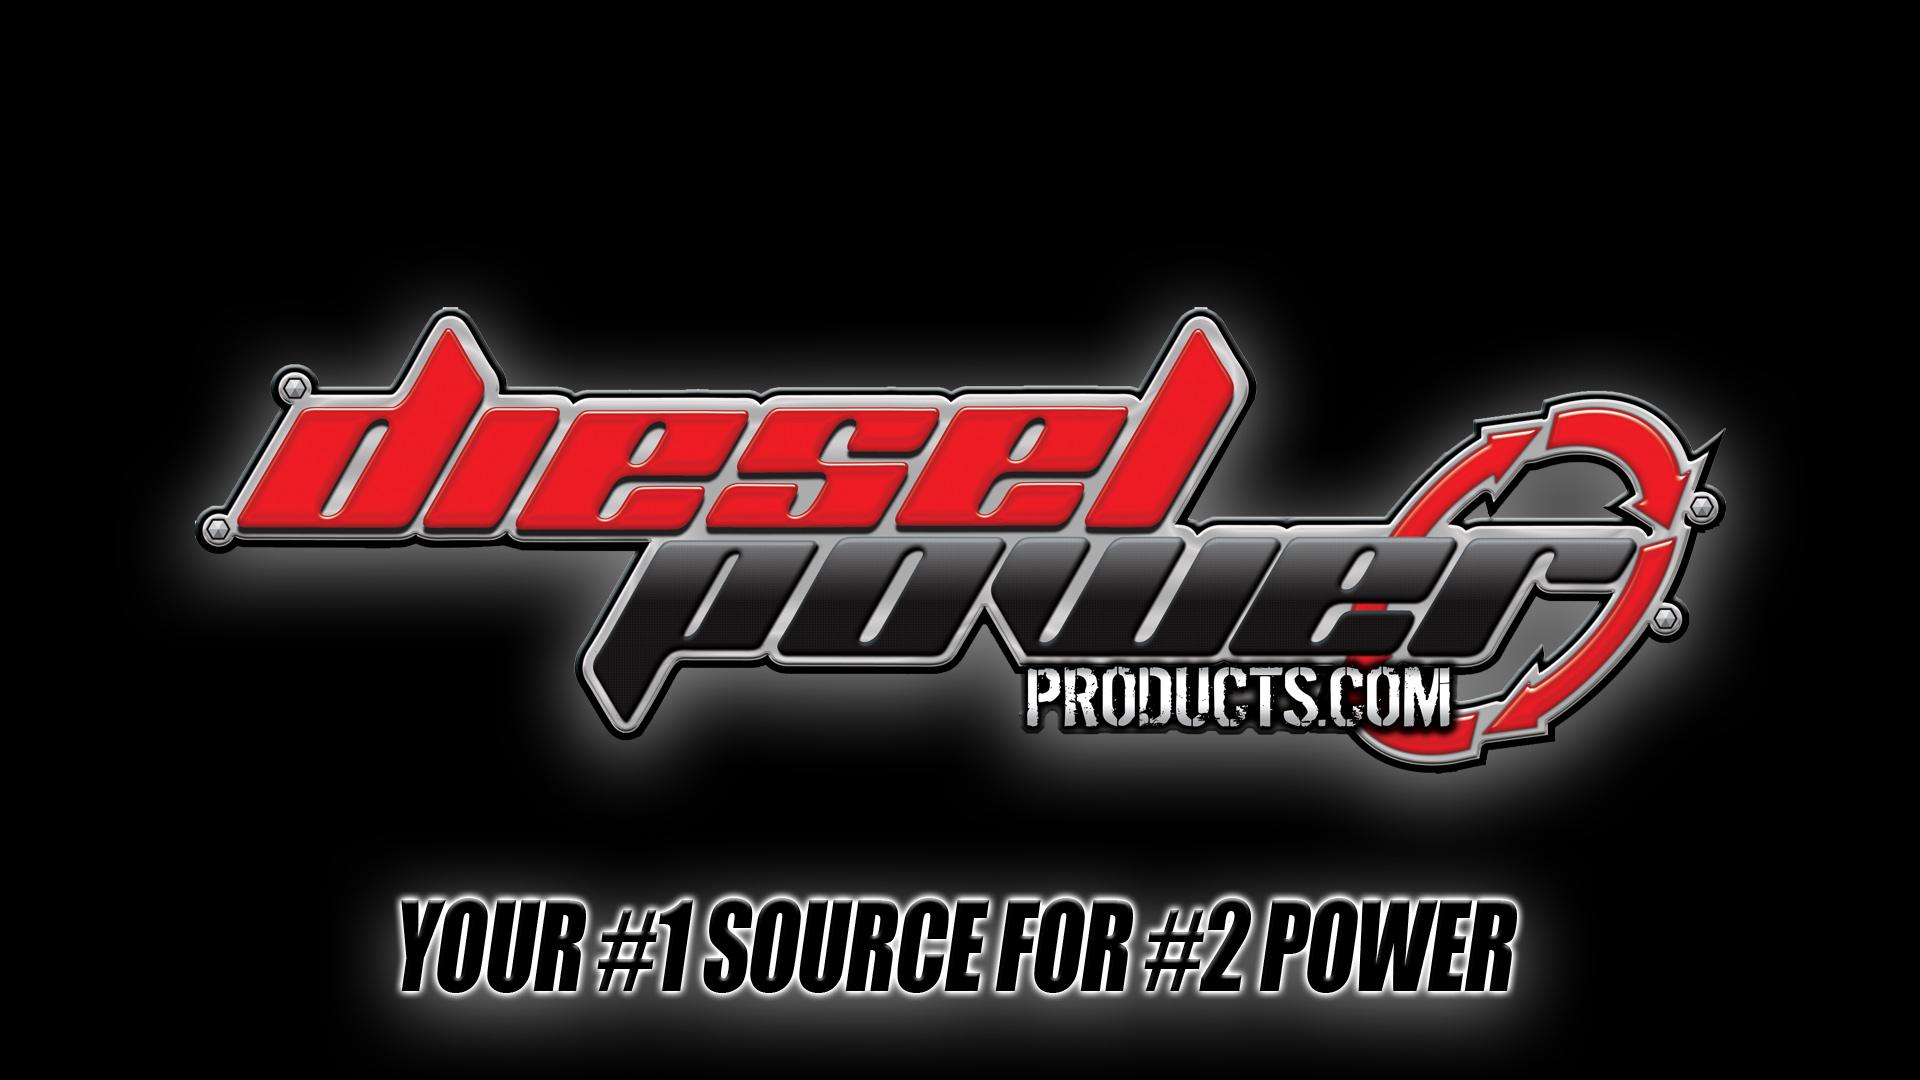 cummins diesel logo wallpaper - photo #36